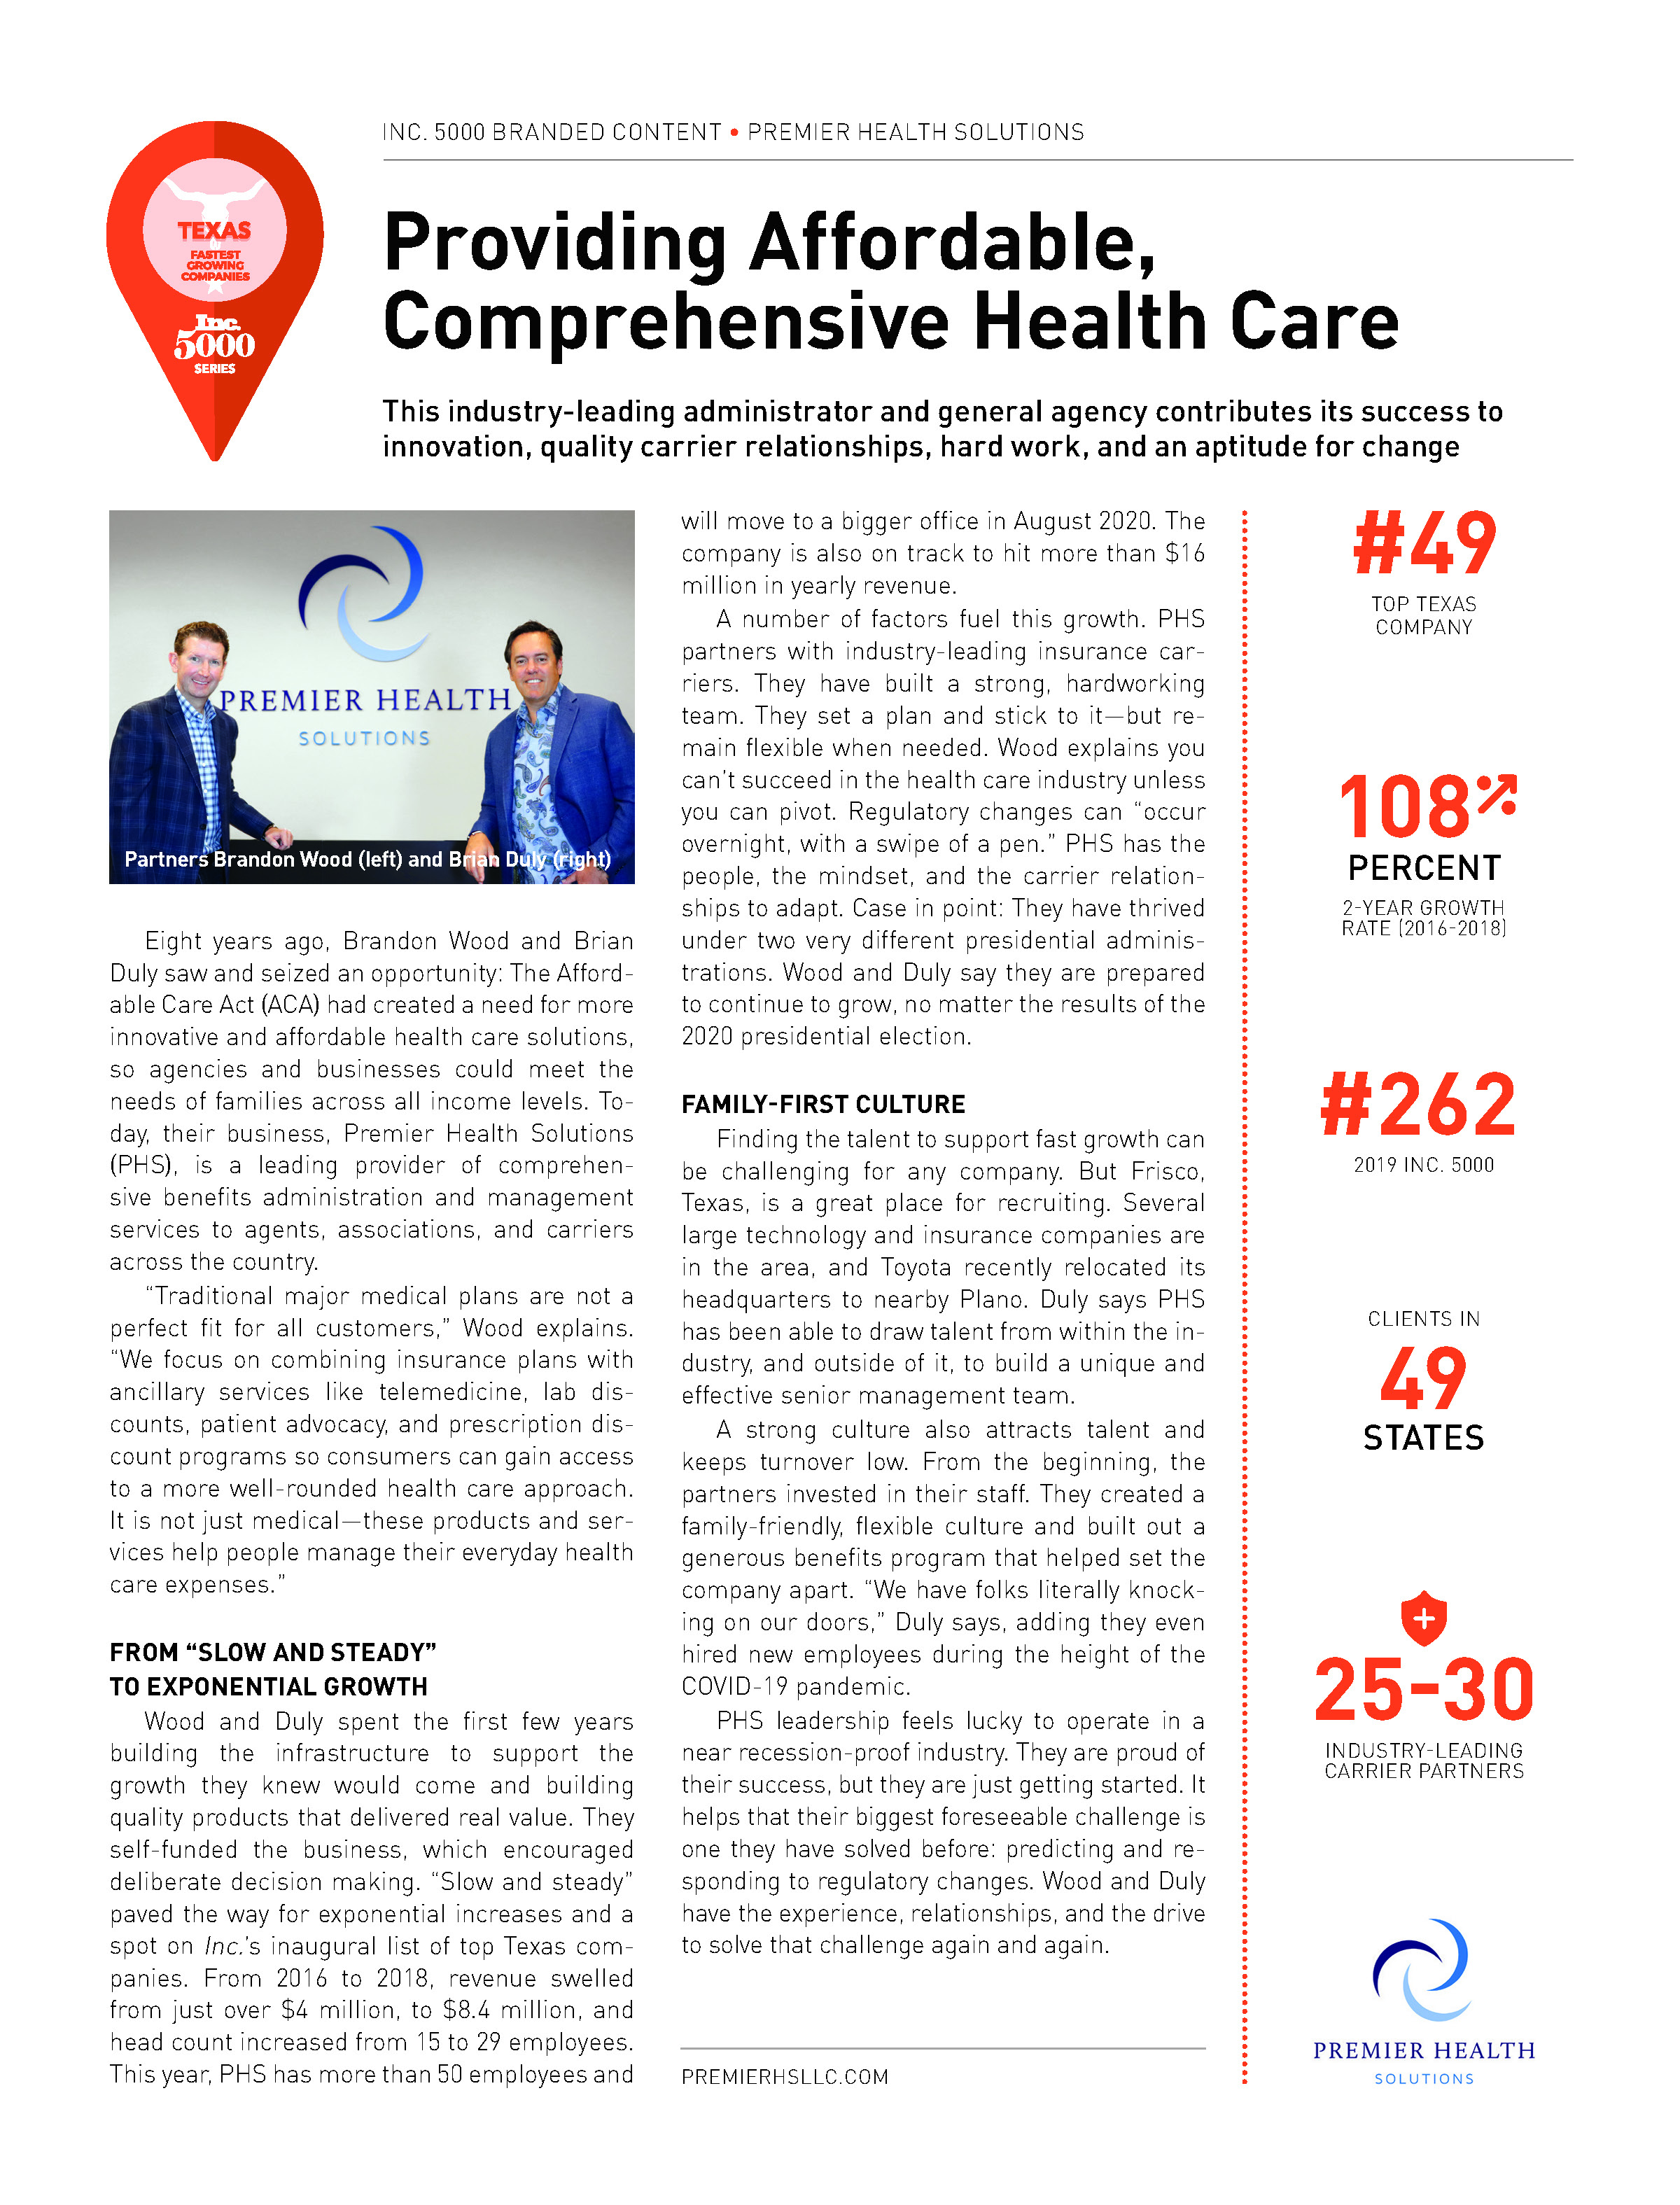 https://www.incimages.com/uploaded_files/franchiseitem/Premier_Health_Solutions_thumb_193.jpg